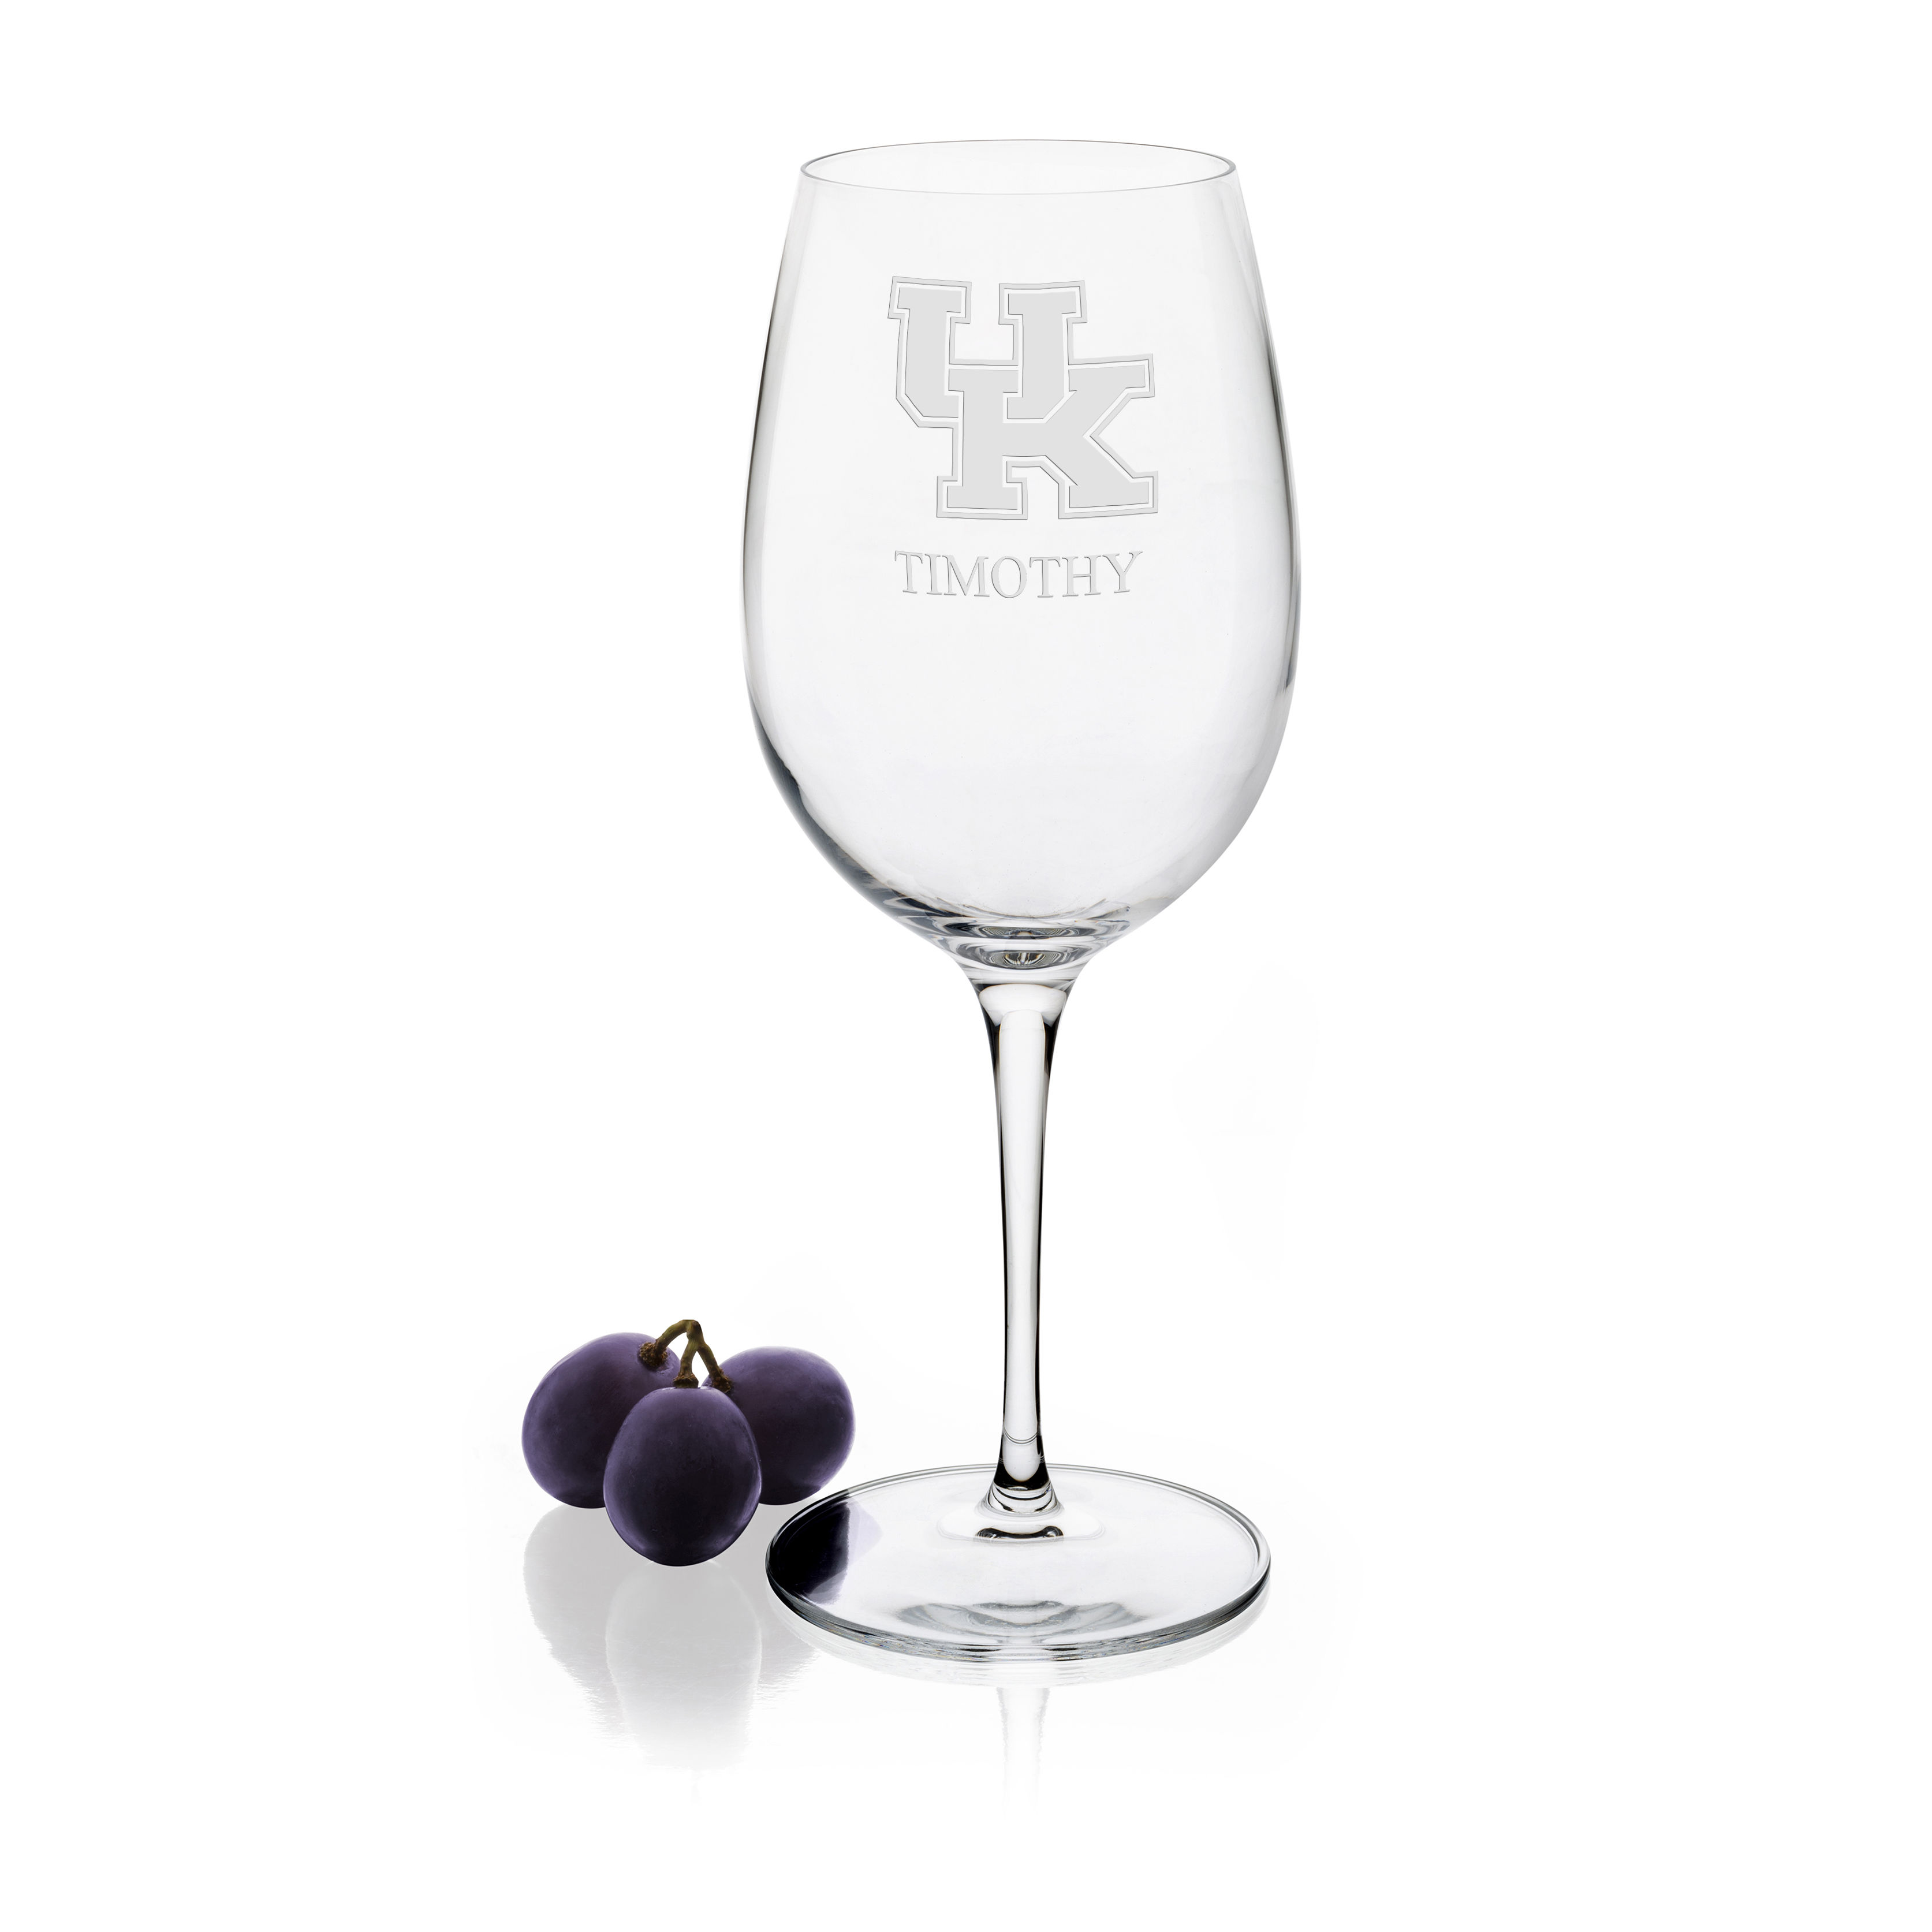 University of Kentucky Red Wine Glasses - Set of 2